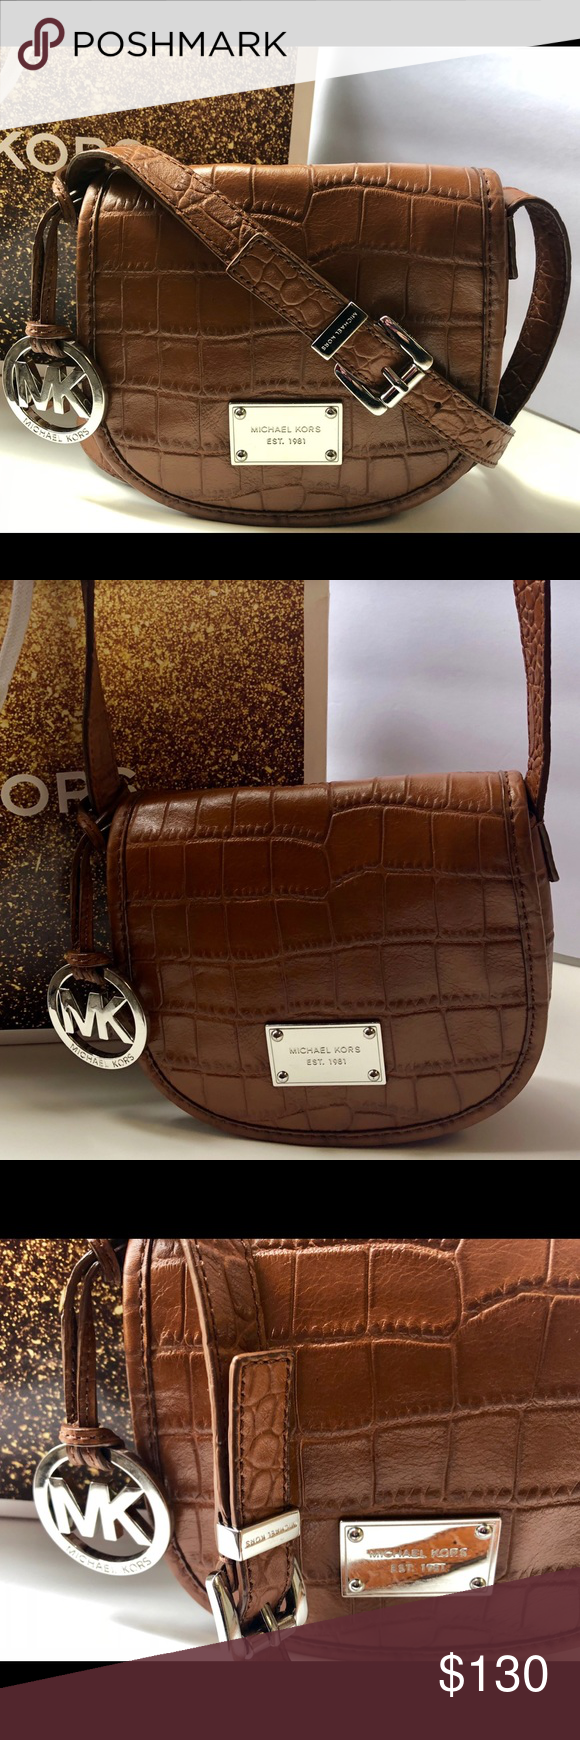 a9017020b229 Michael Kors Ginny Embossed Acorn CrossBody Excellent Condition ) Michael  Kors Ginny Embossed Leather Acorn